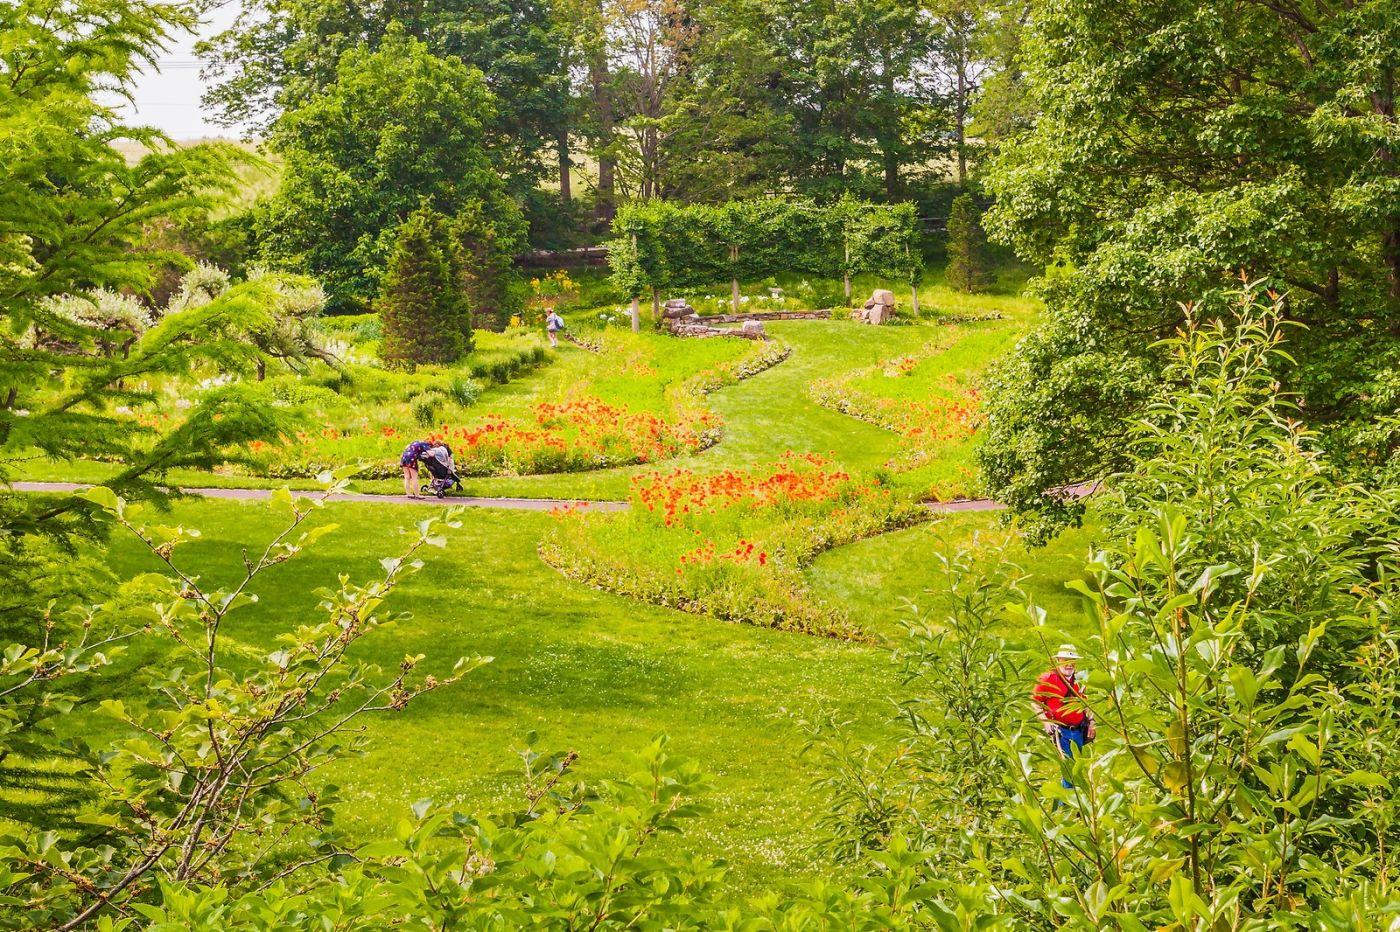 Chanticleer花园,融入自然_图1-14